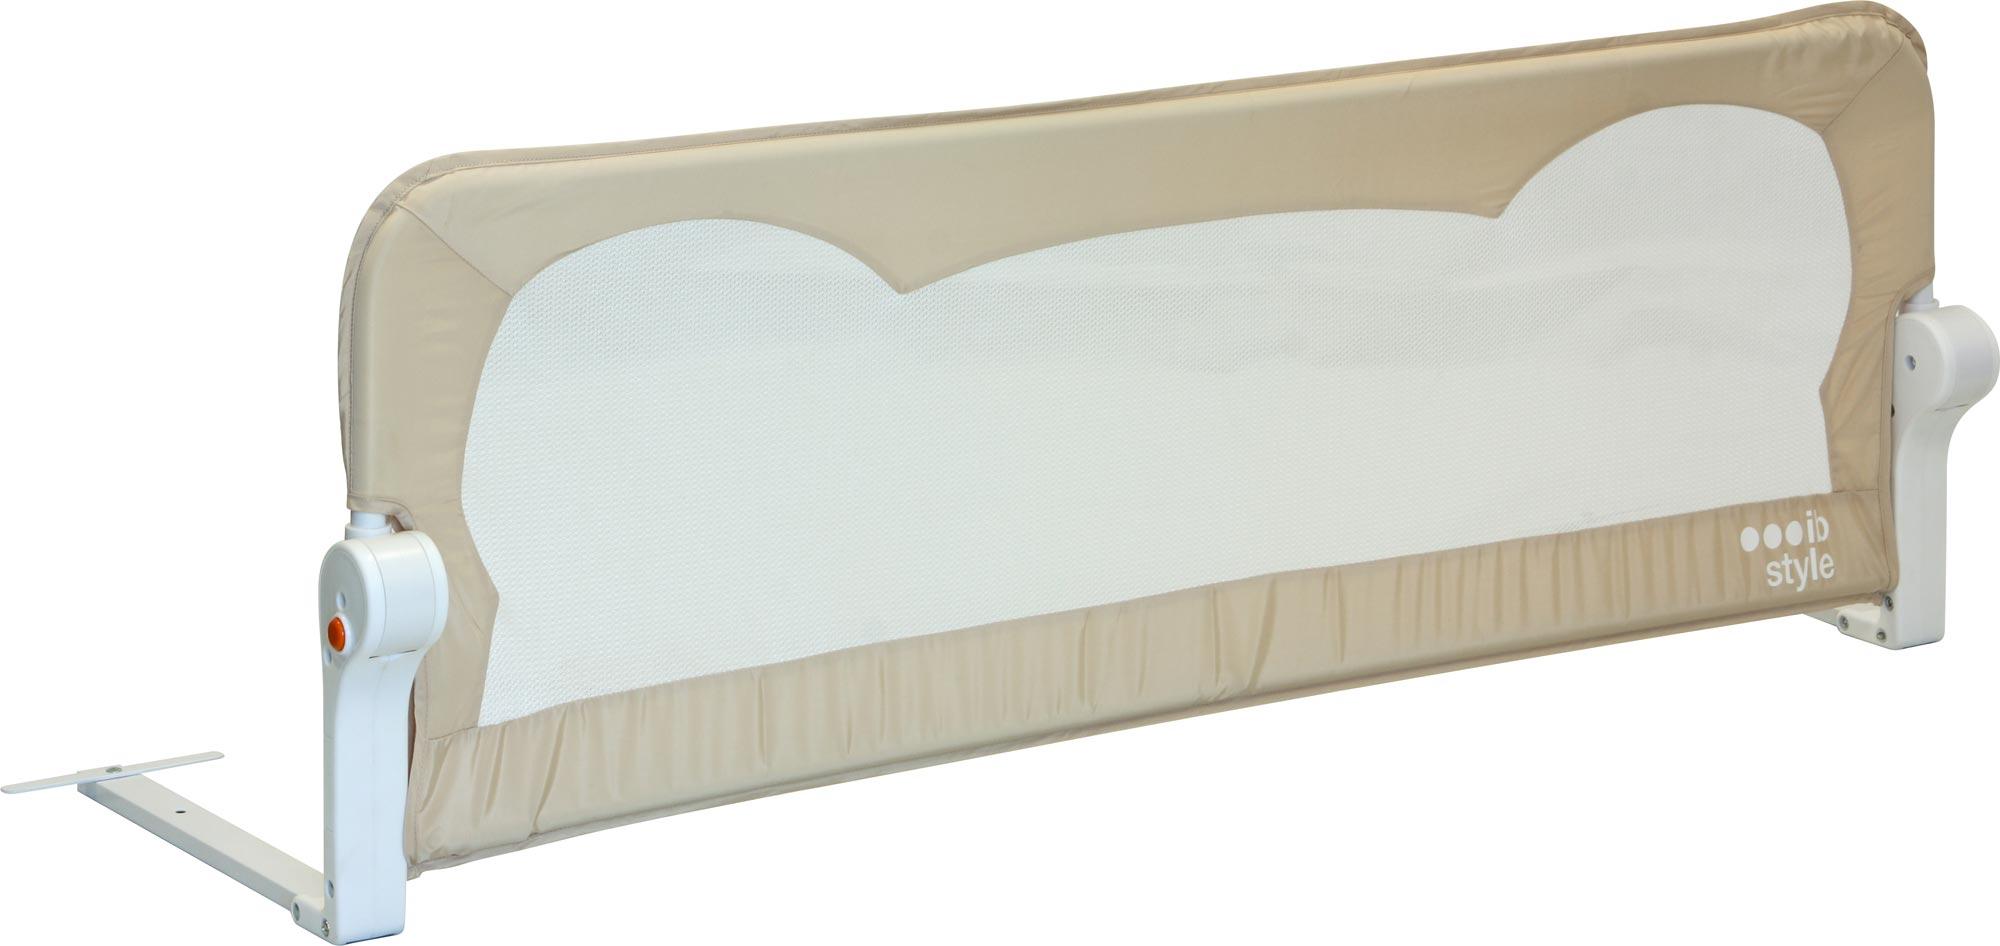 barri re de lit 102 120 150 180 x 42 portable rabattable safetybutton b b ebay. Black Bedroom Furniture Sets. Home Design Ideas